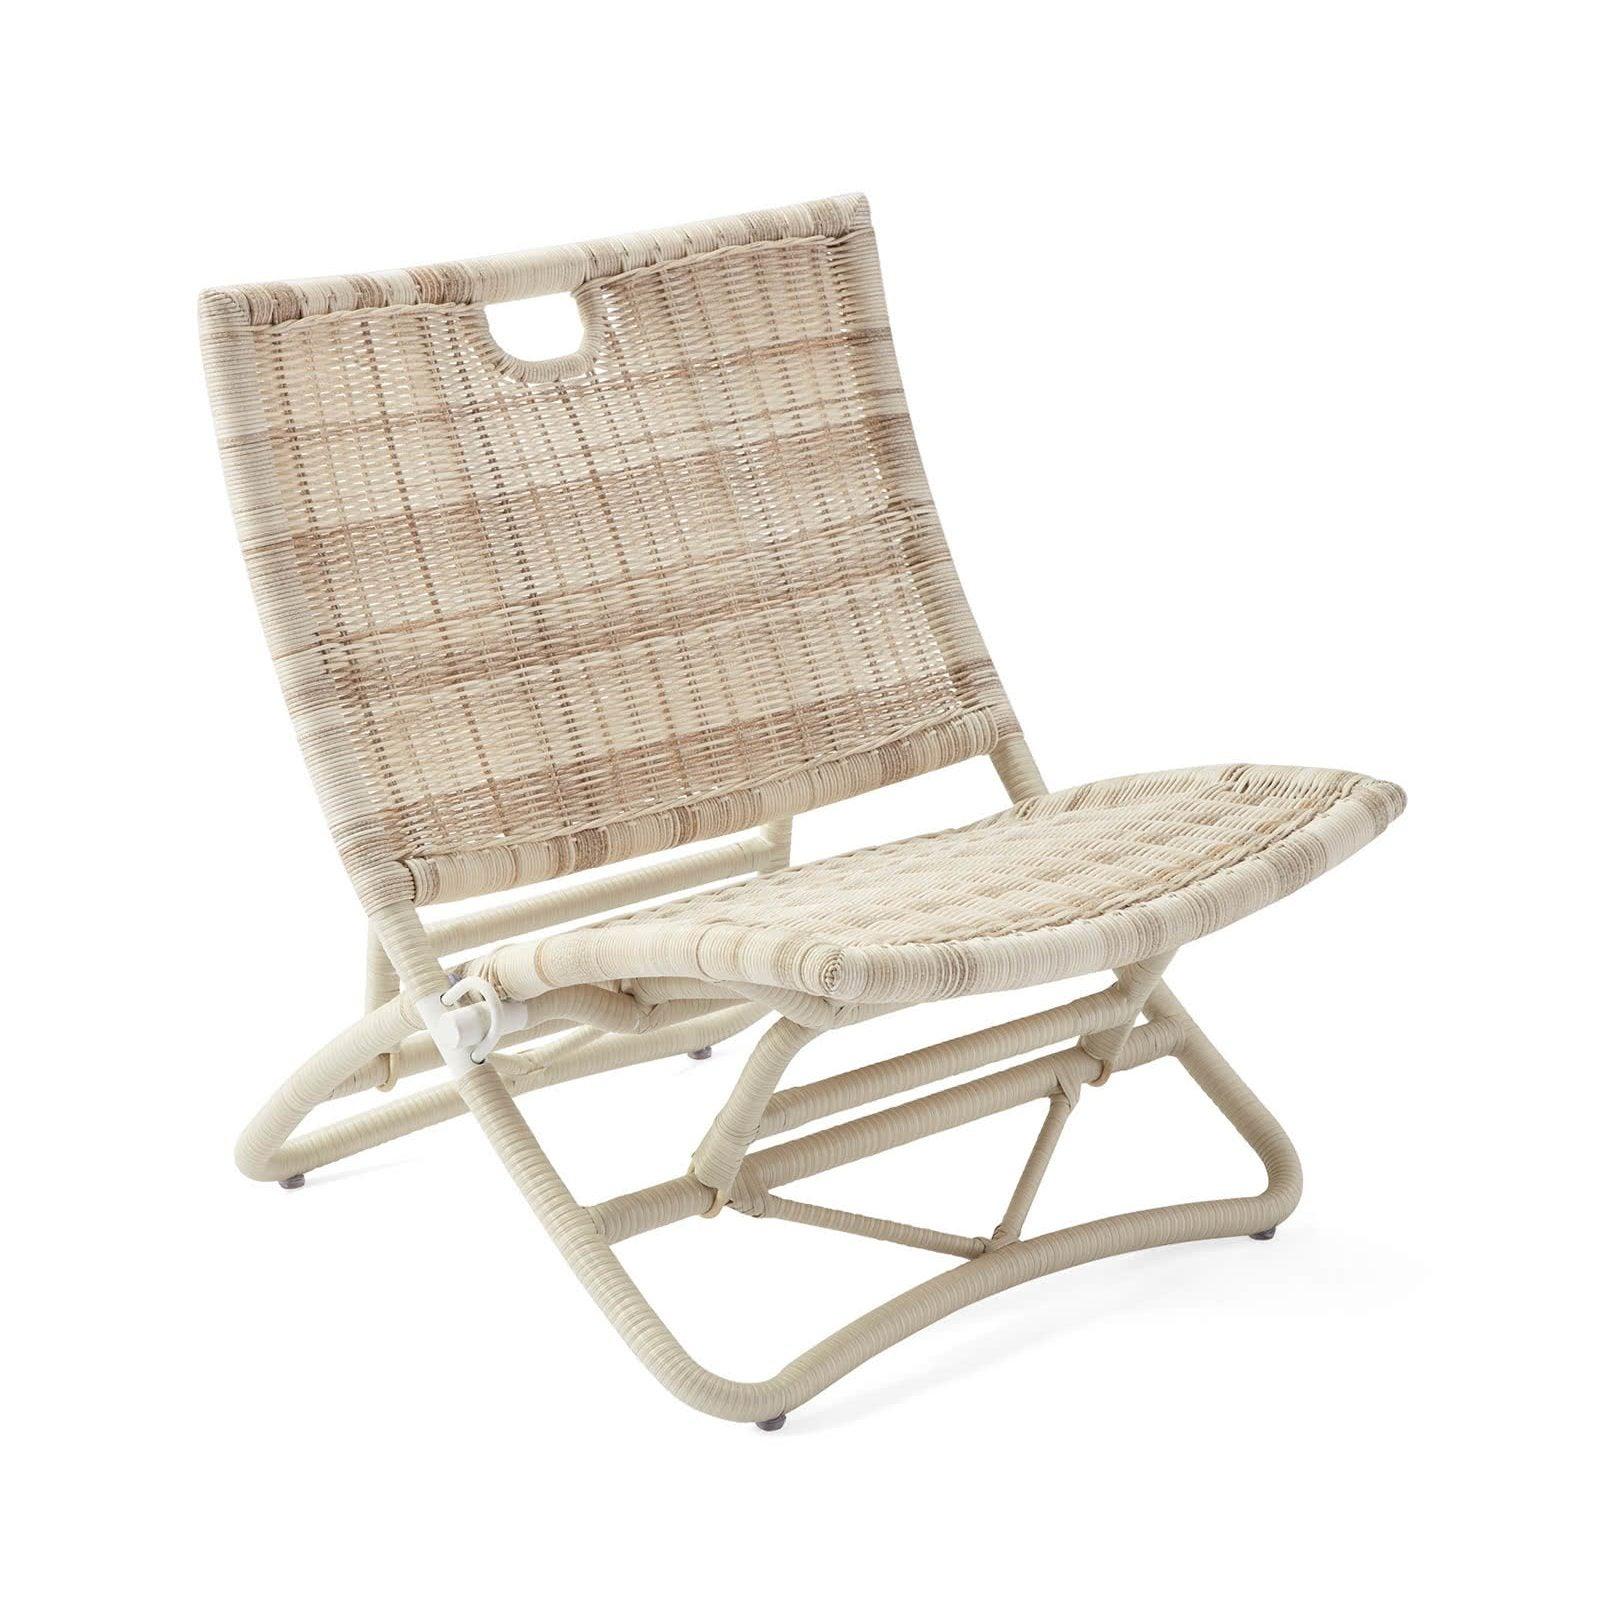 Furn_Palisades_Outdoor_Chair_Driftwood_Angle_MV_0580_Crop_SH